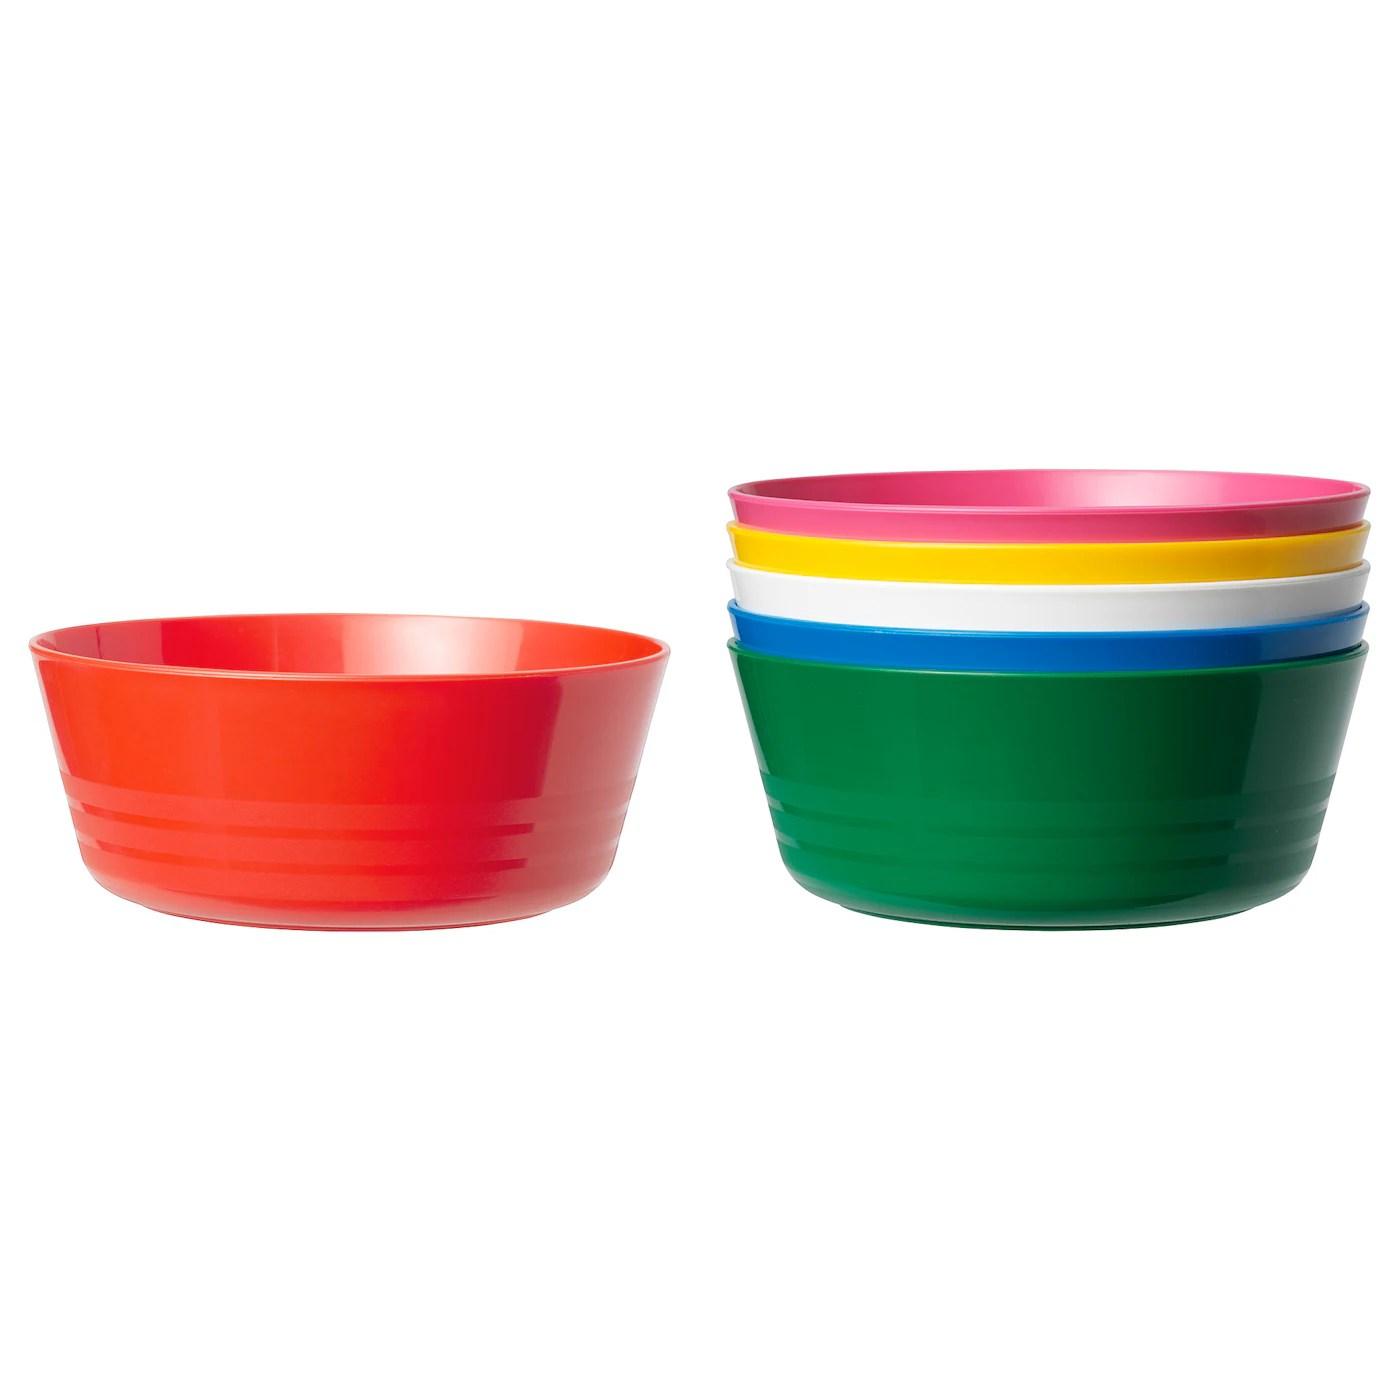 kalas bowl multicolour